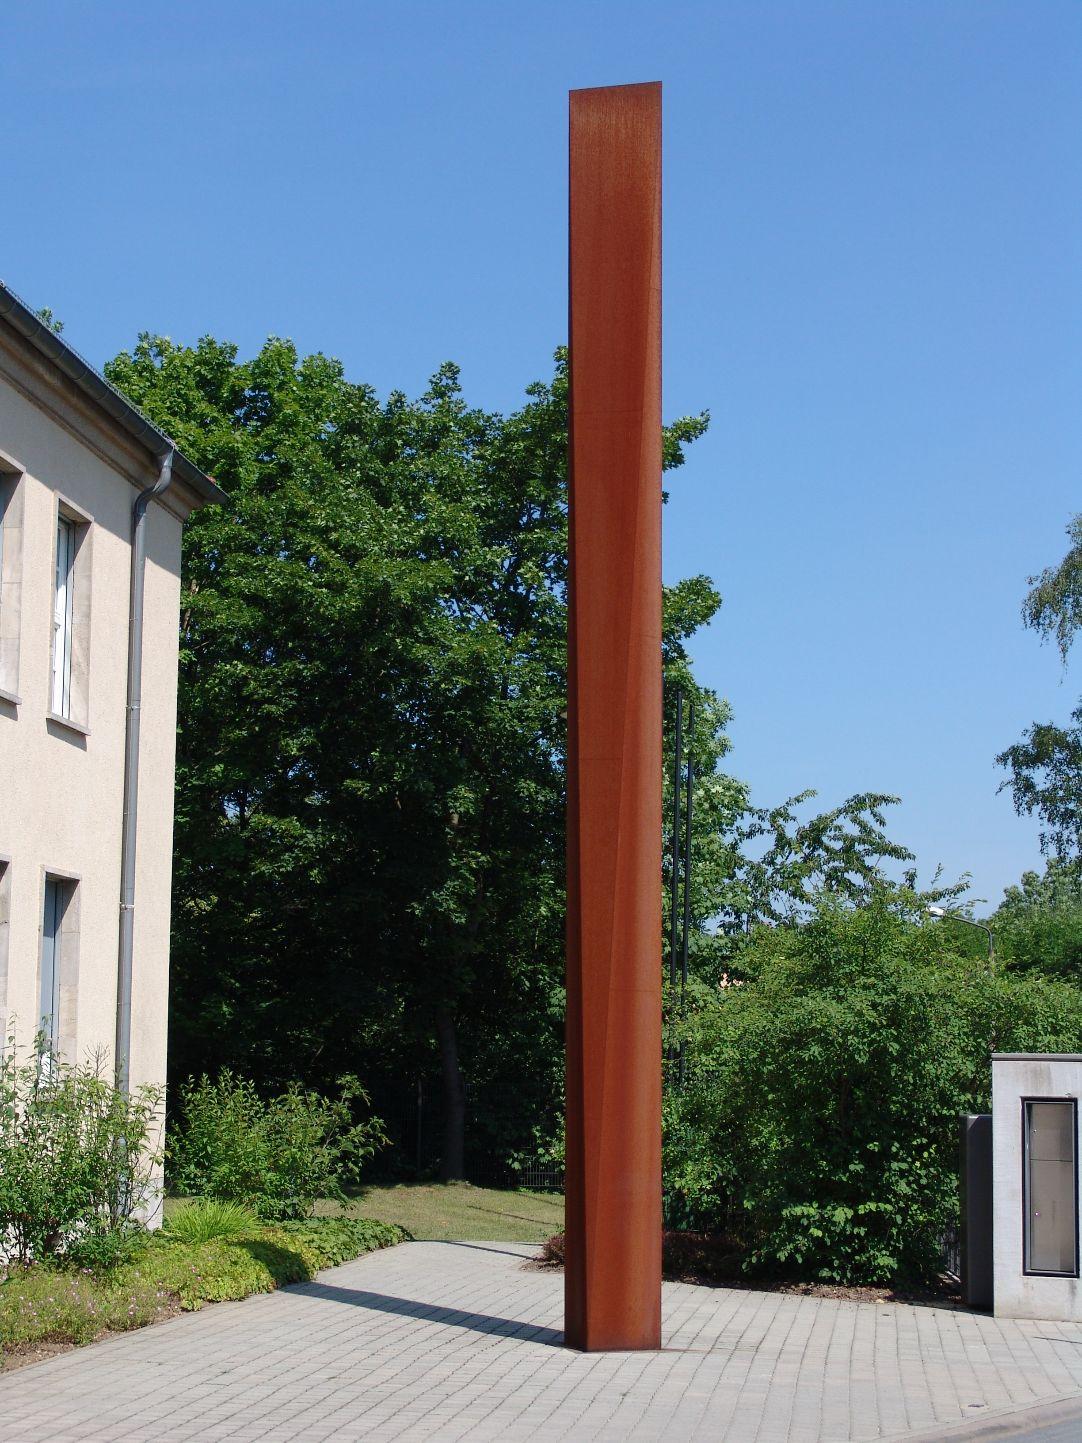 09027b_Kunst am Bau